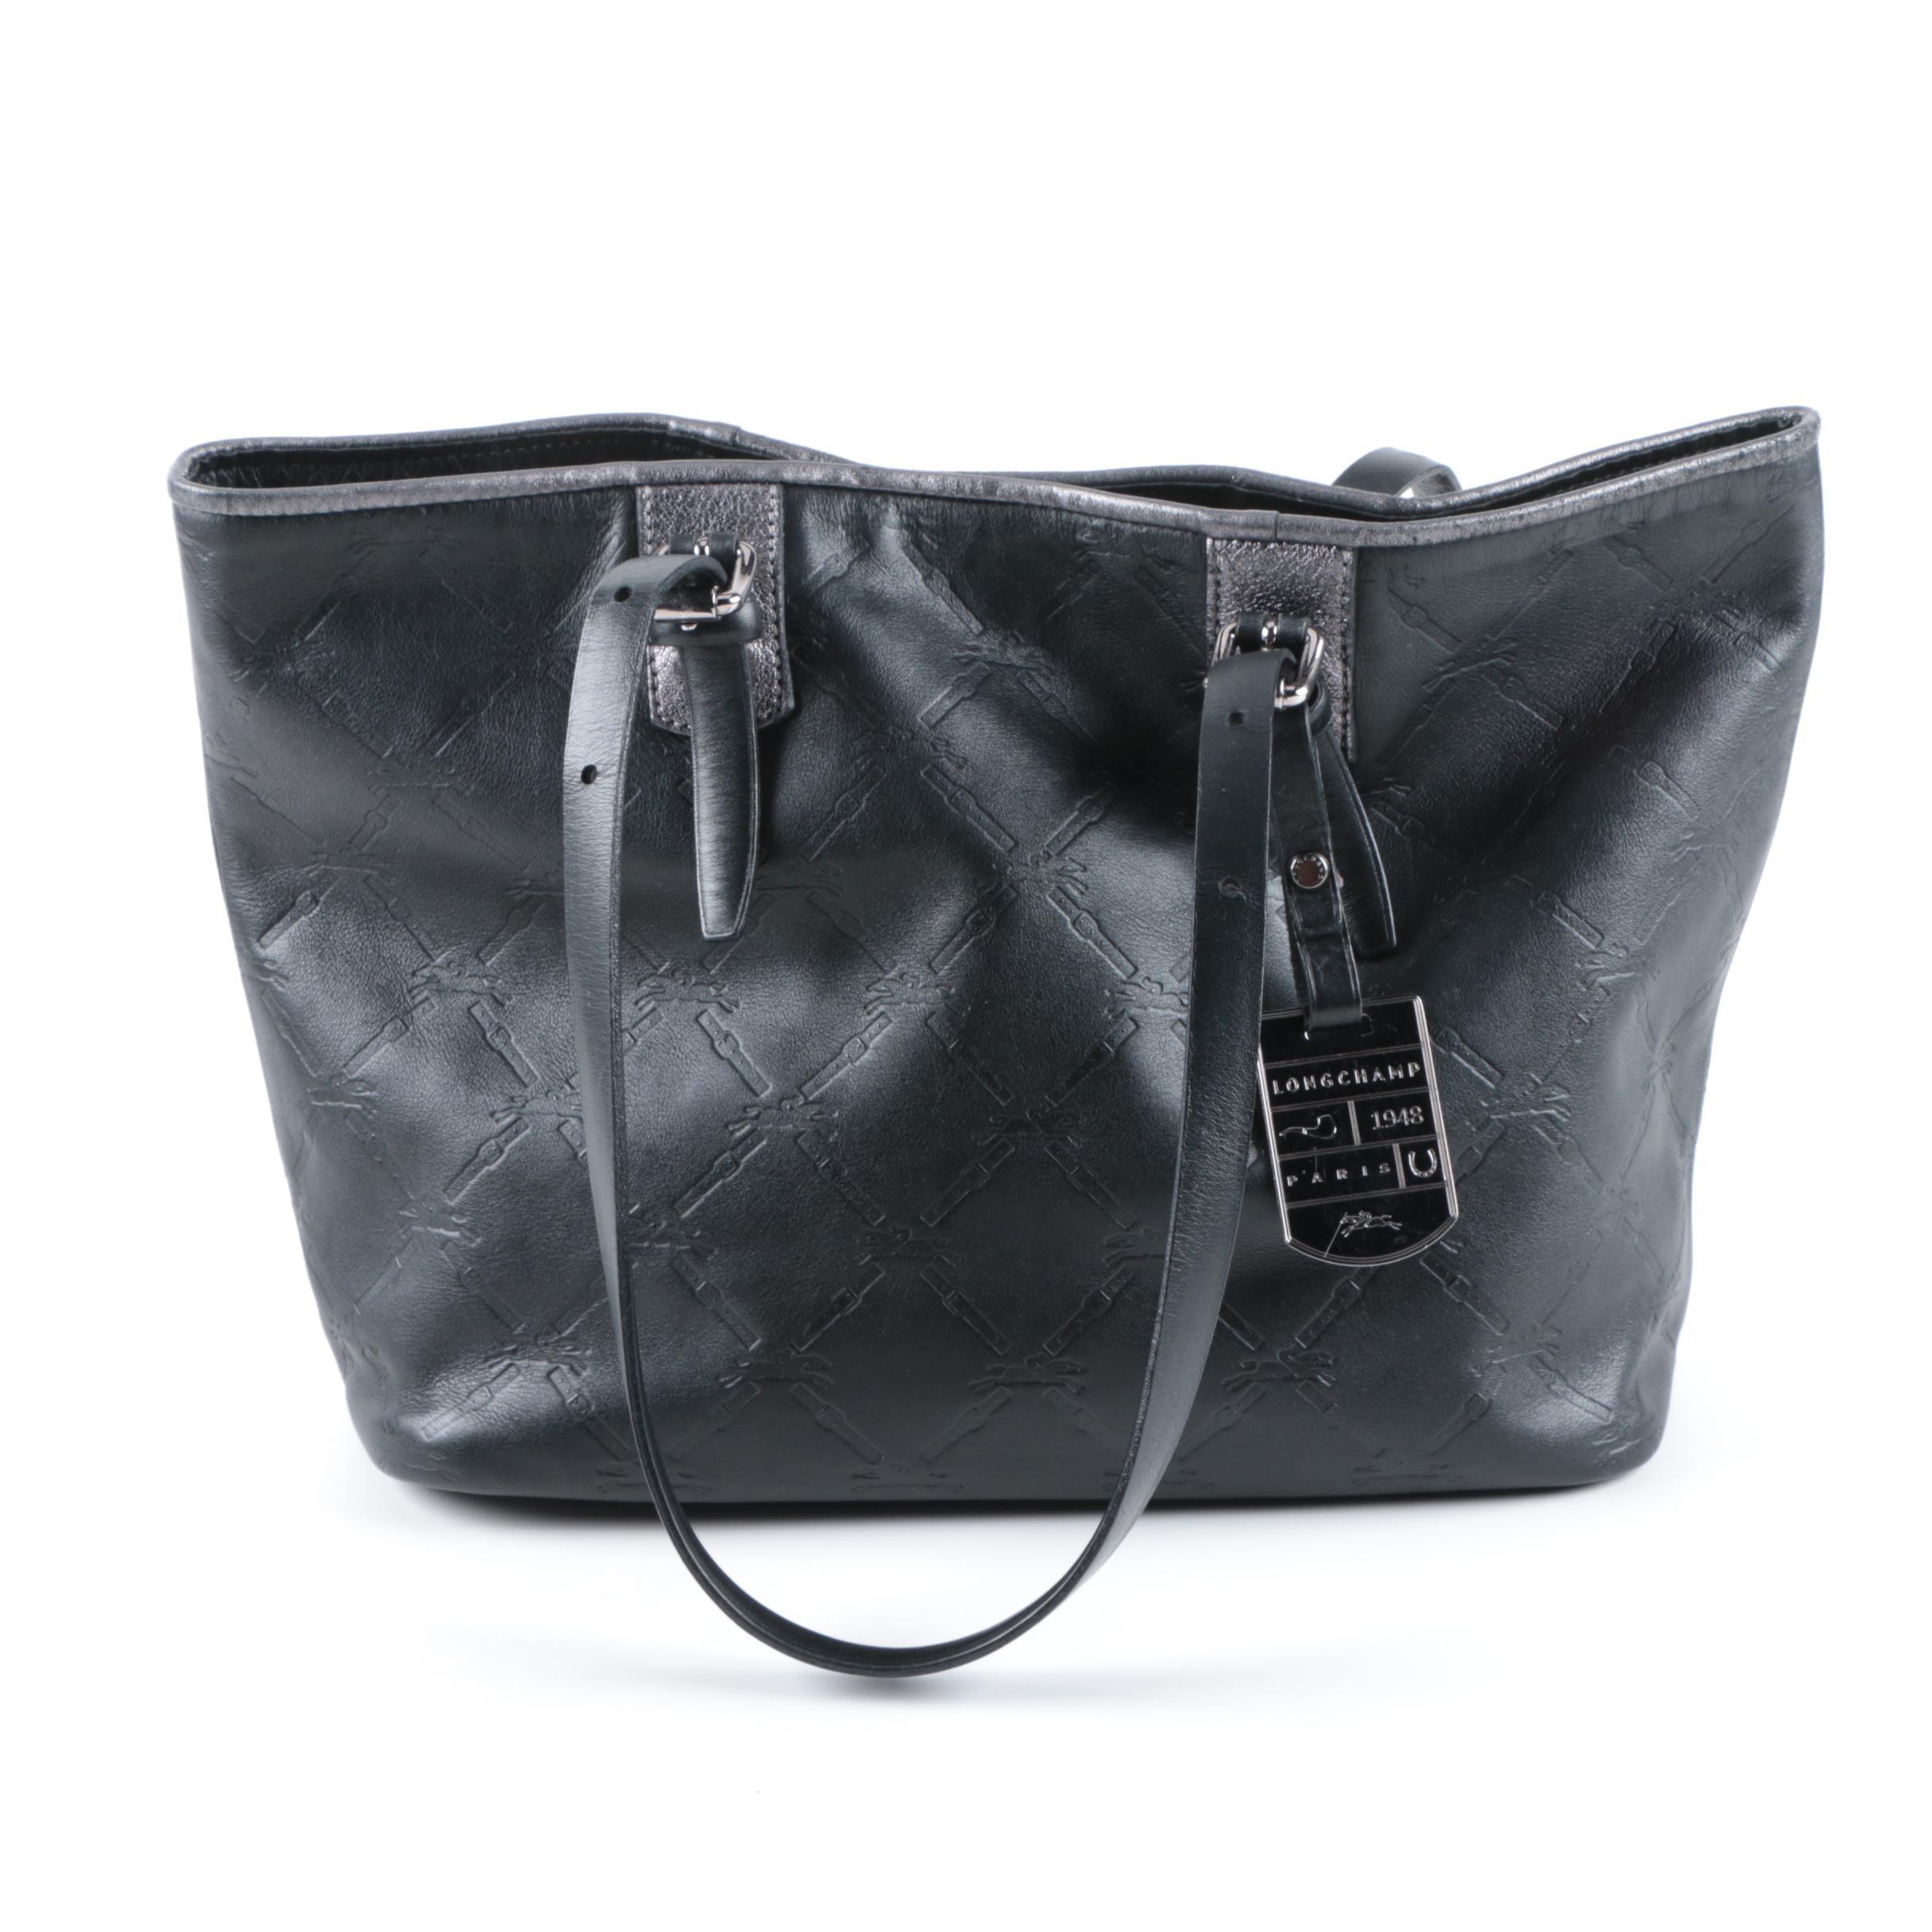 Longchamp Black Leather Tote Bag